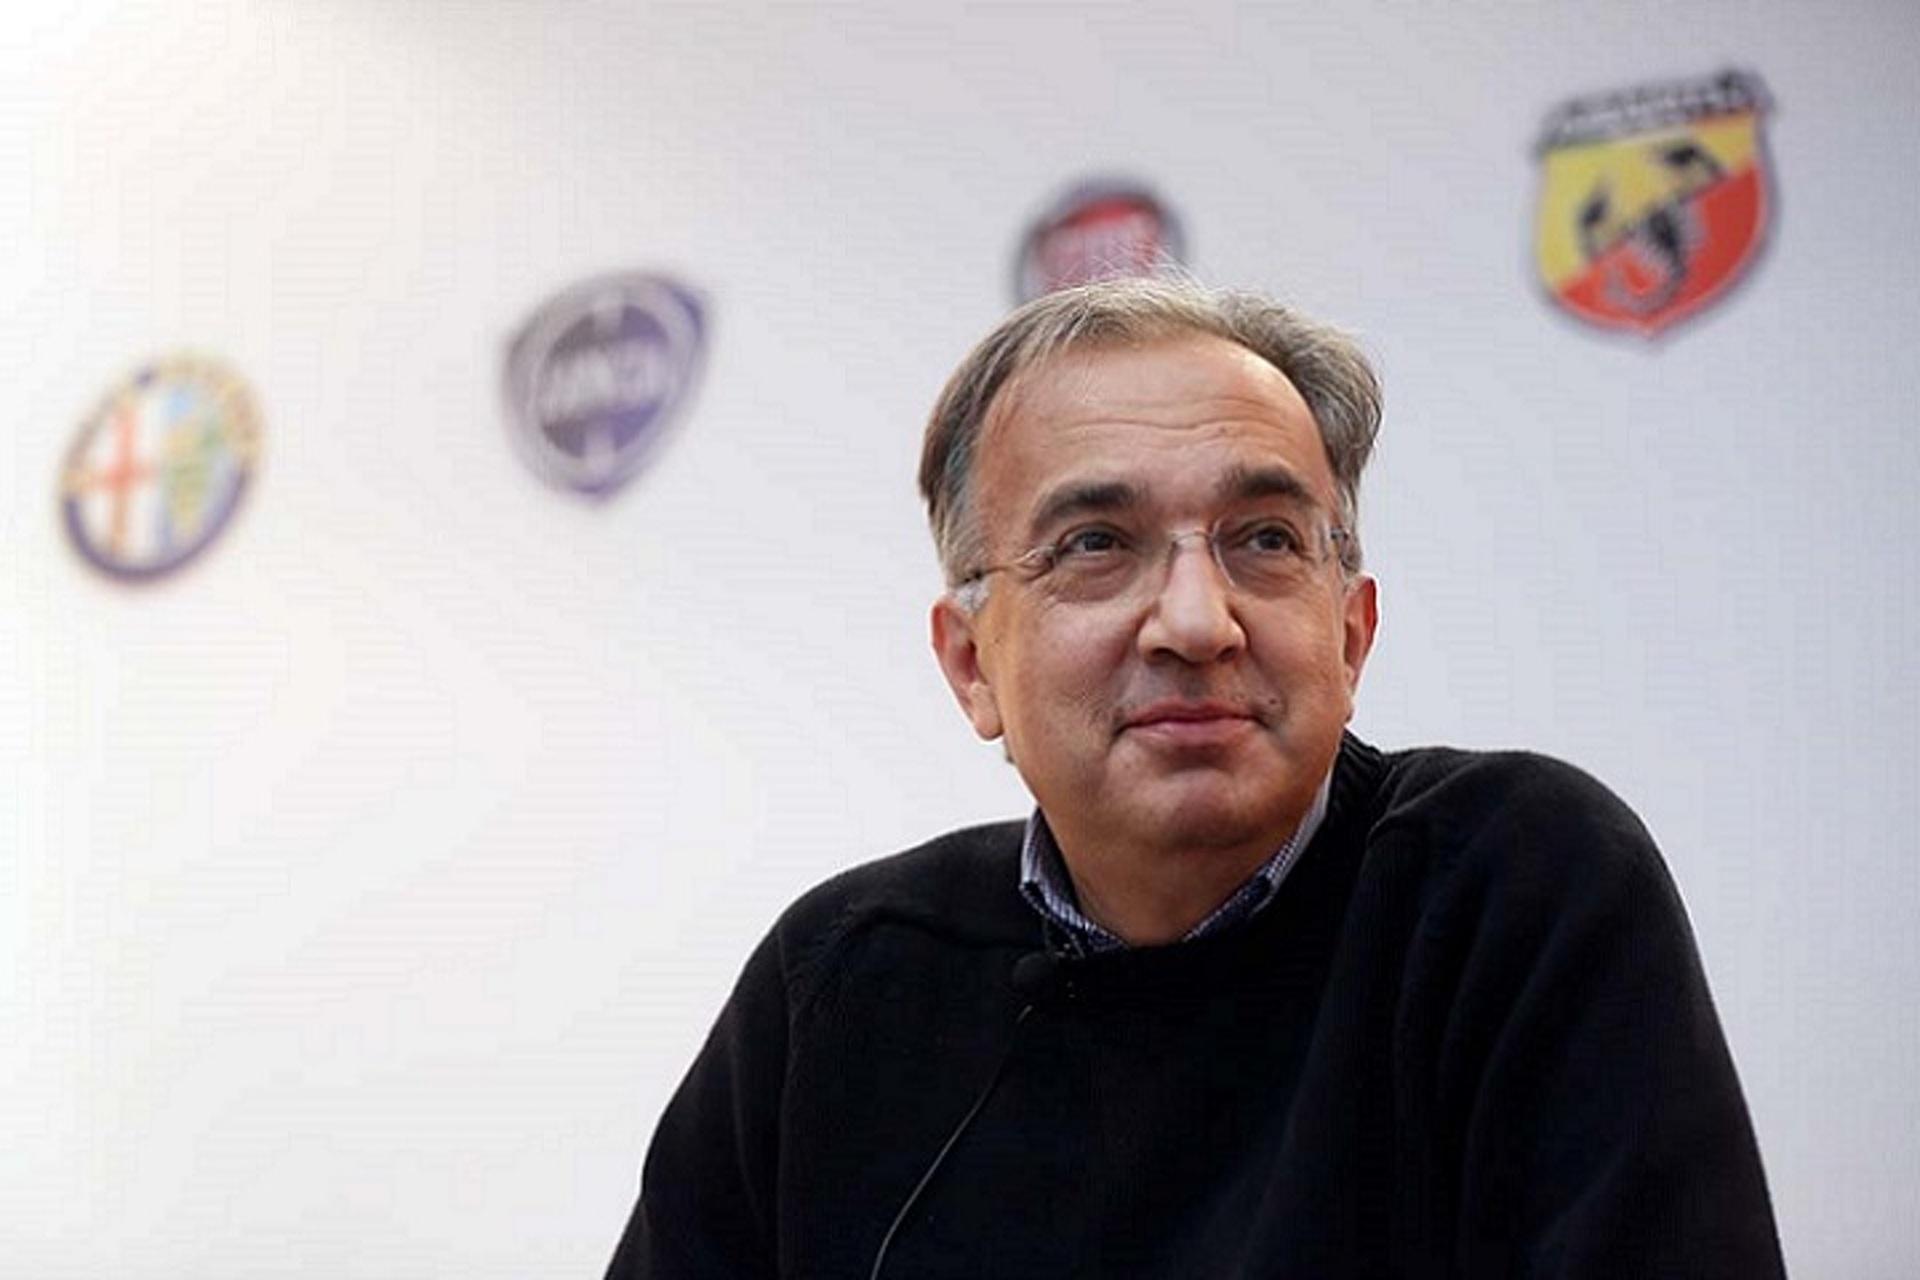 FCA CEO Sergio Marchionne canceled his Paris Motor Show appearance